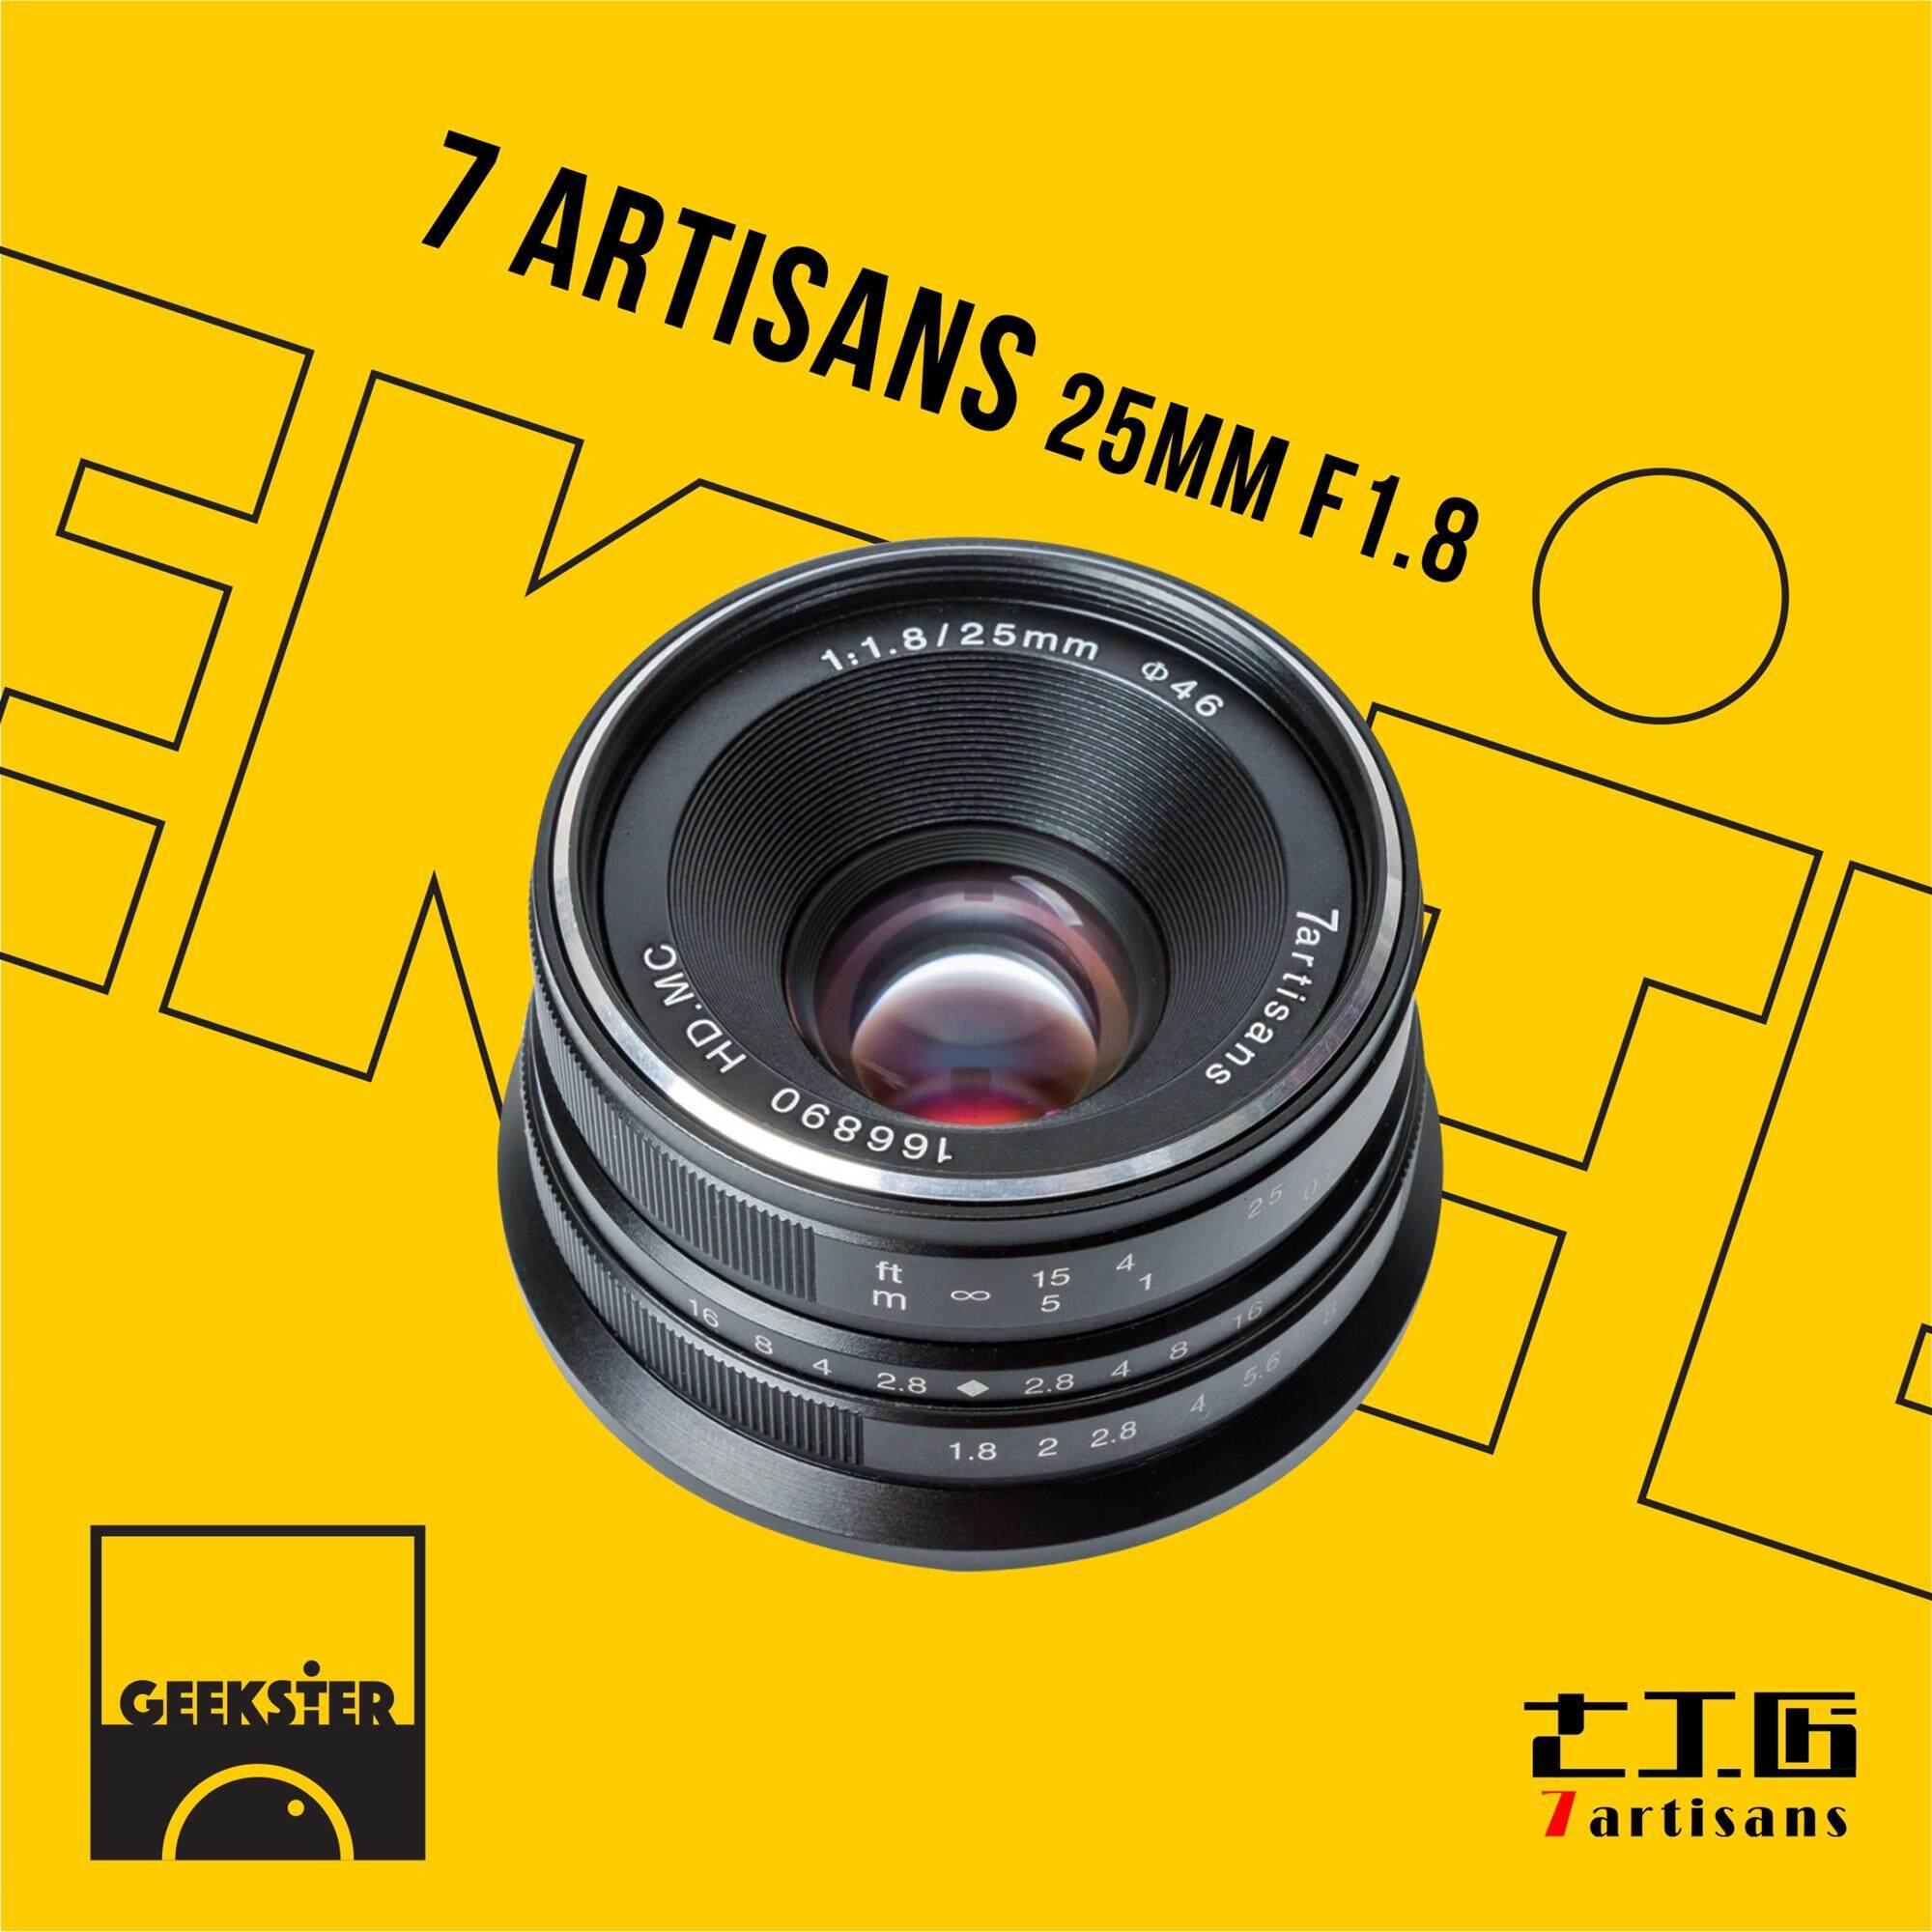 7artisans ⭐️ 25 Mm F1.8 Lens ⭐️ เลนส์มือหมุน สำหรับกล้อง Fuji ( เลนส์หลังละลาย ) ( เลนส์มือหมุน ) ( เลนส์ หน้าชัดหลังเบลอ ) ( สำหรับ กล้อง ฟูจิ ) ( เมาท์ Fx ) ( X Mount ) ( 25mm 1.8 ) ( Geekster ).